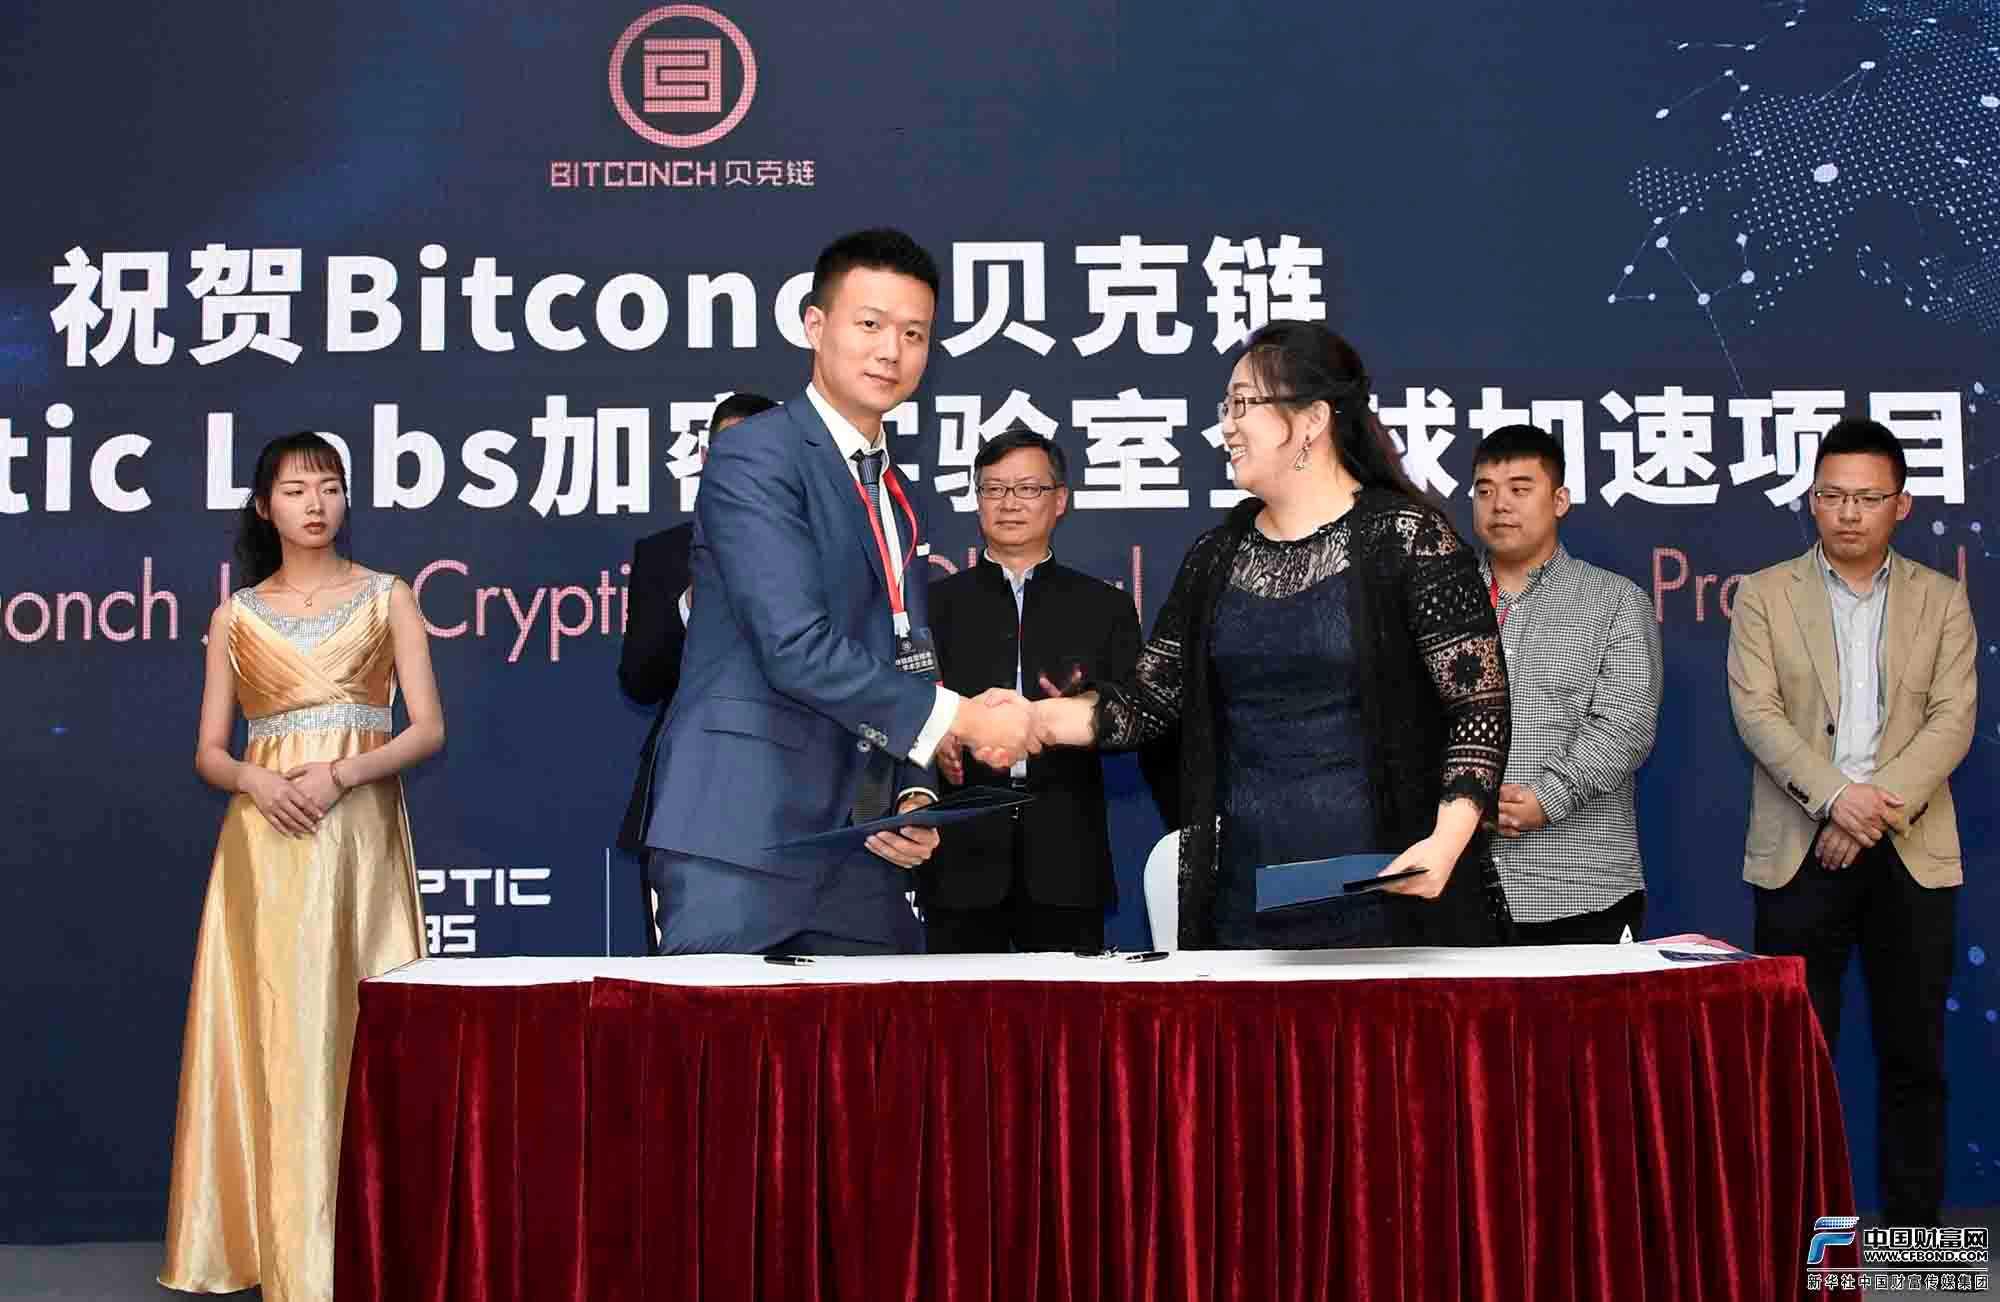 Cryptic Labs 和BitConch 签约仪式